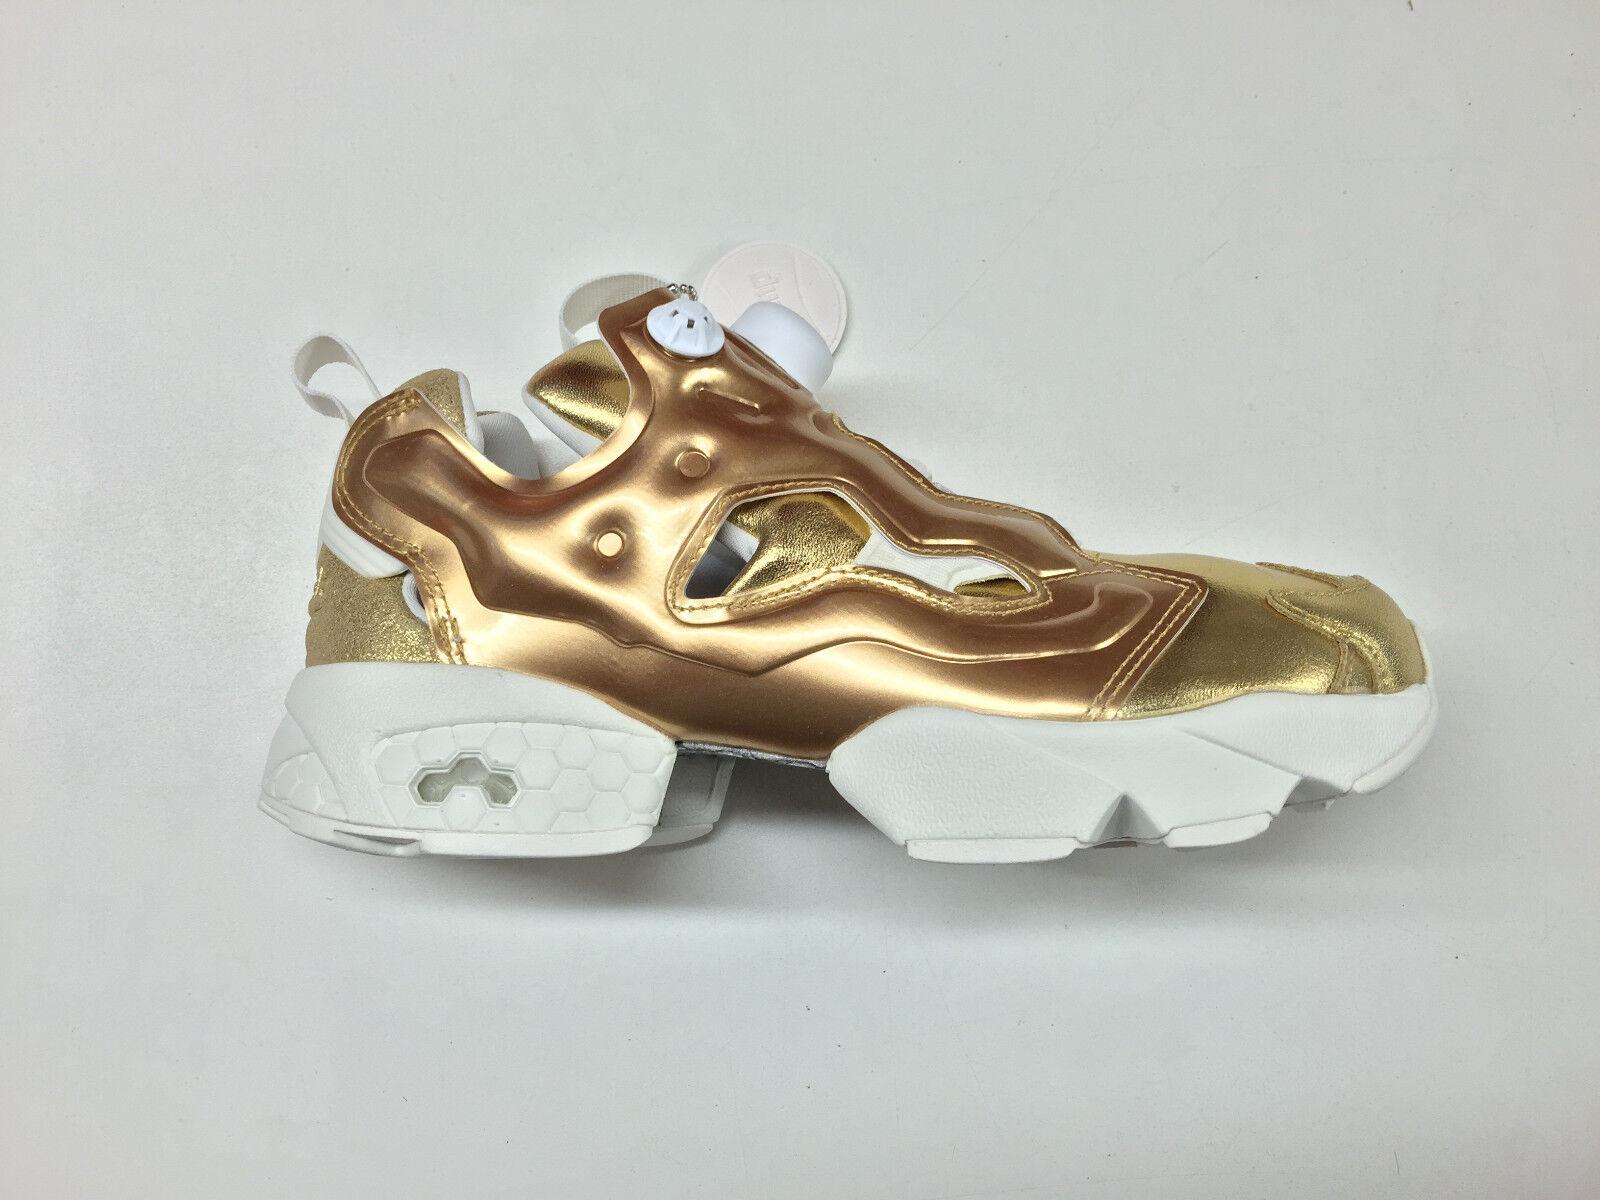 Reebok femmes InstaPump Fury Celebrate Pot O' Gold Brass Trainers V70094 1702-74